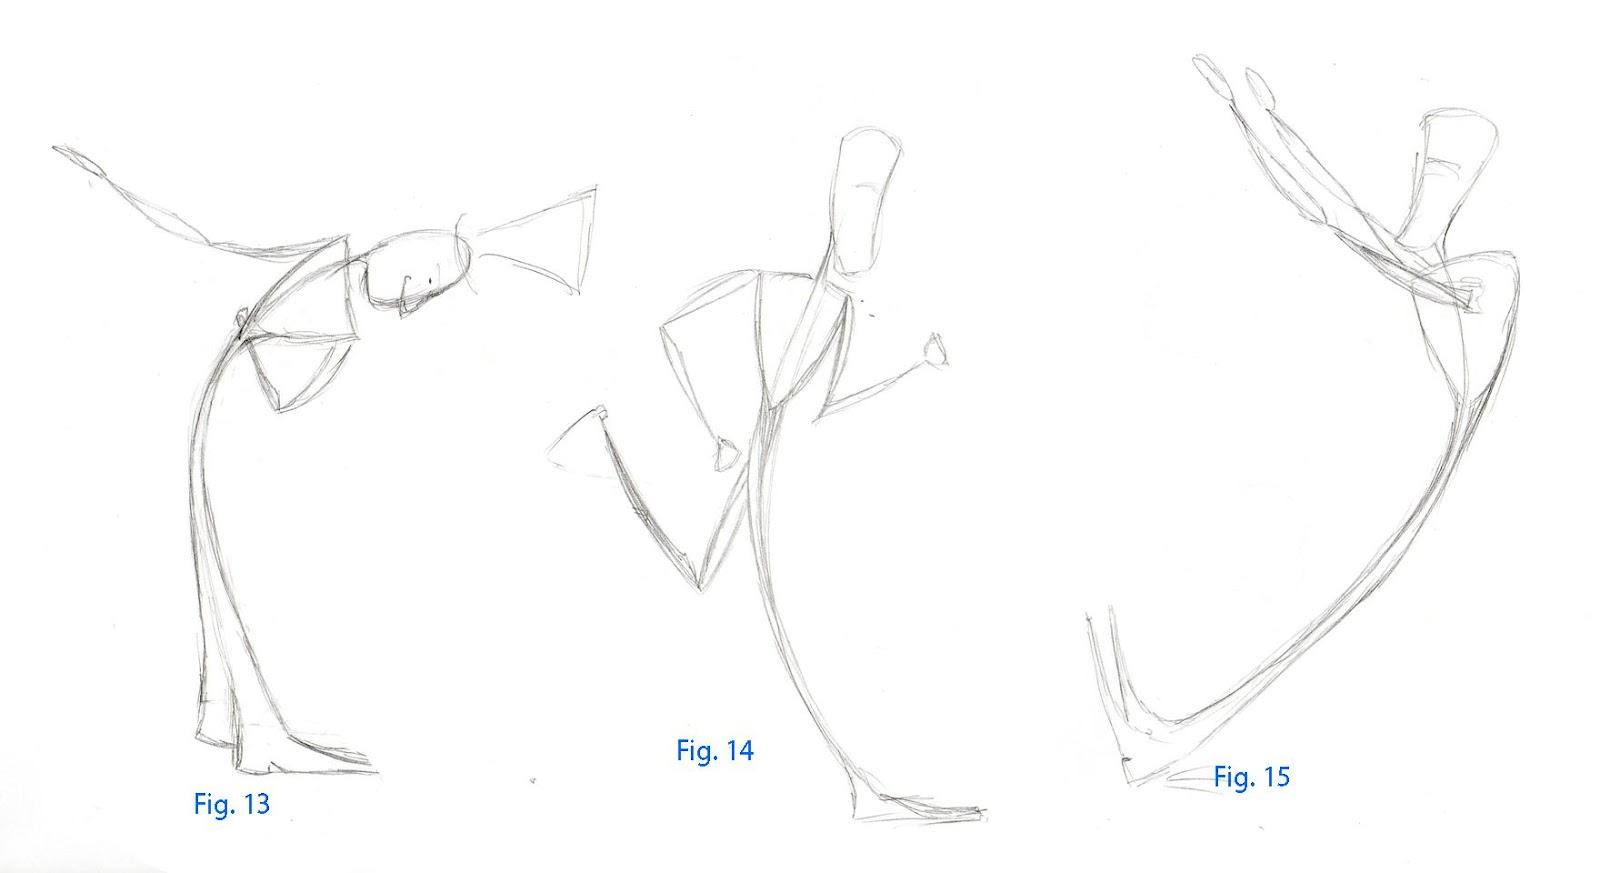 Unit 4 Character Designs